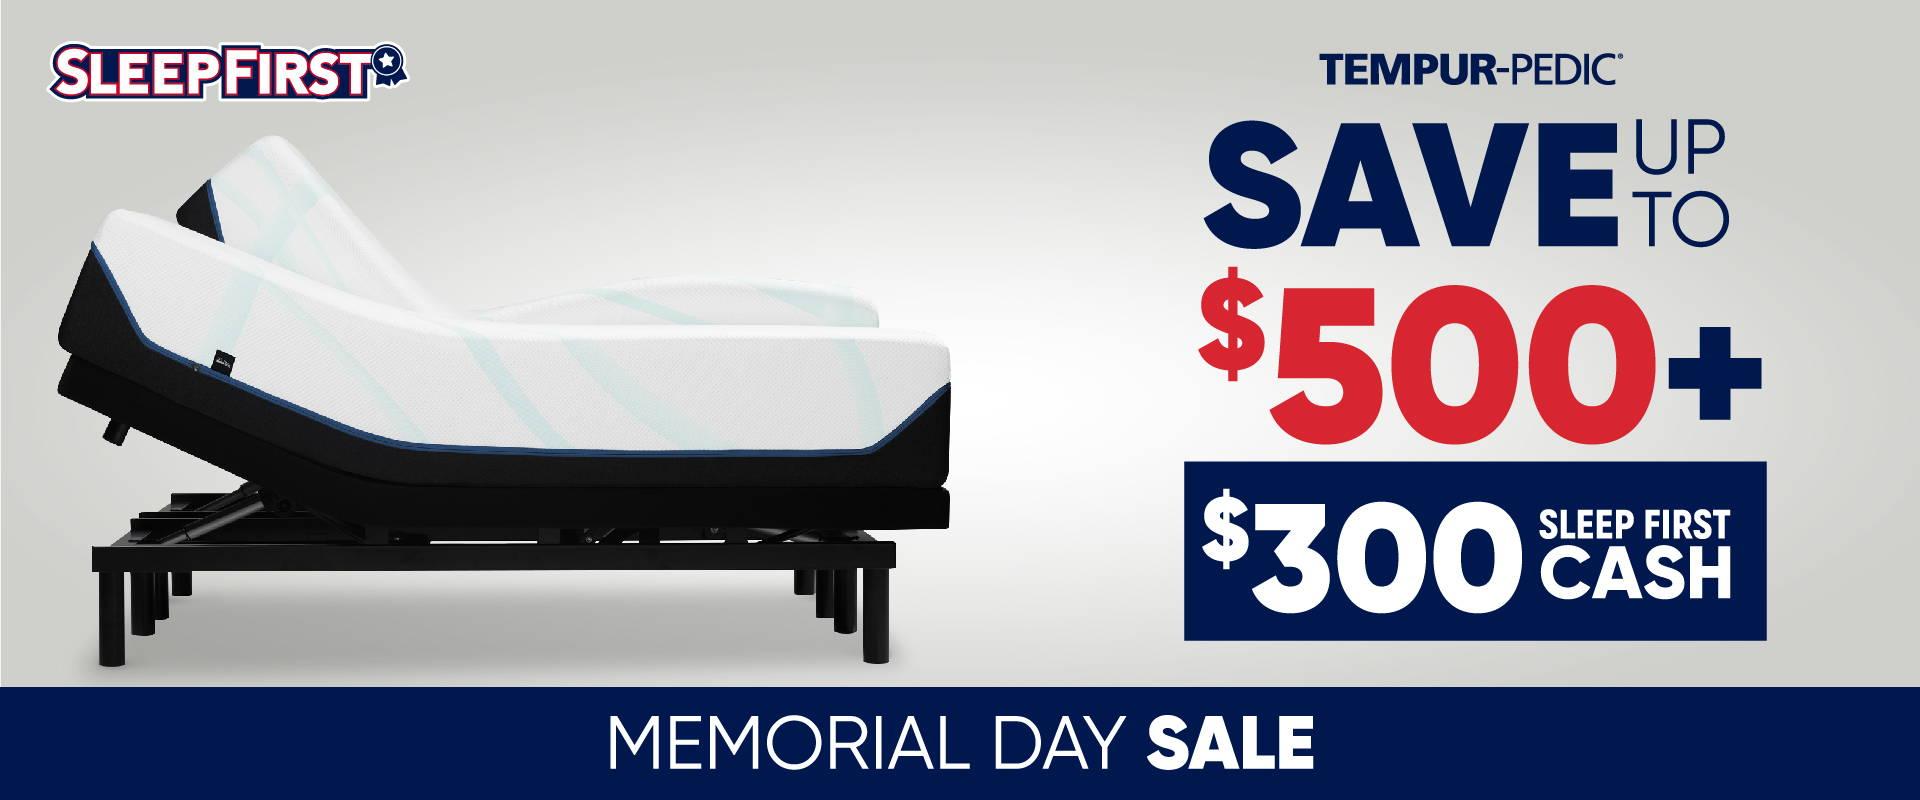 Sleep First Memorial Day Tempurpedic Mattress Sale